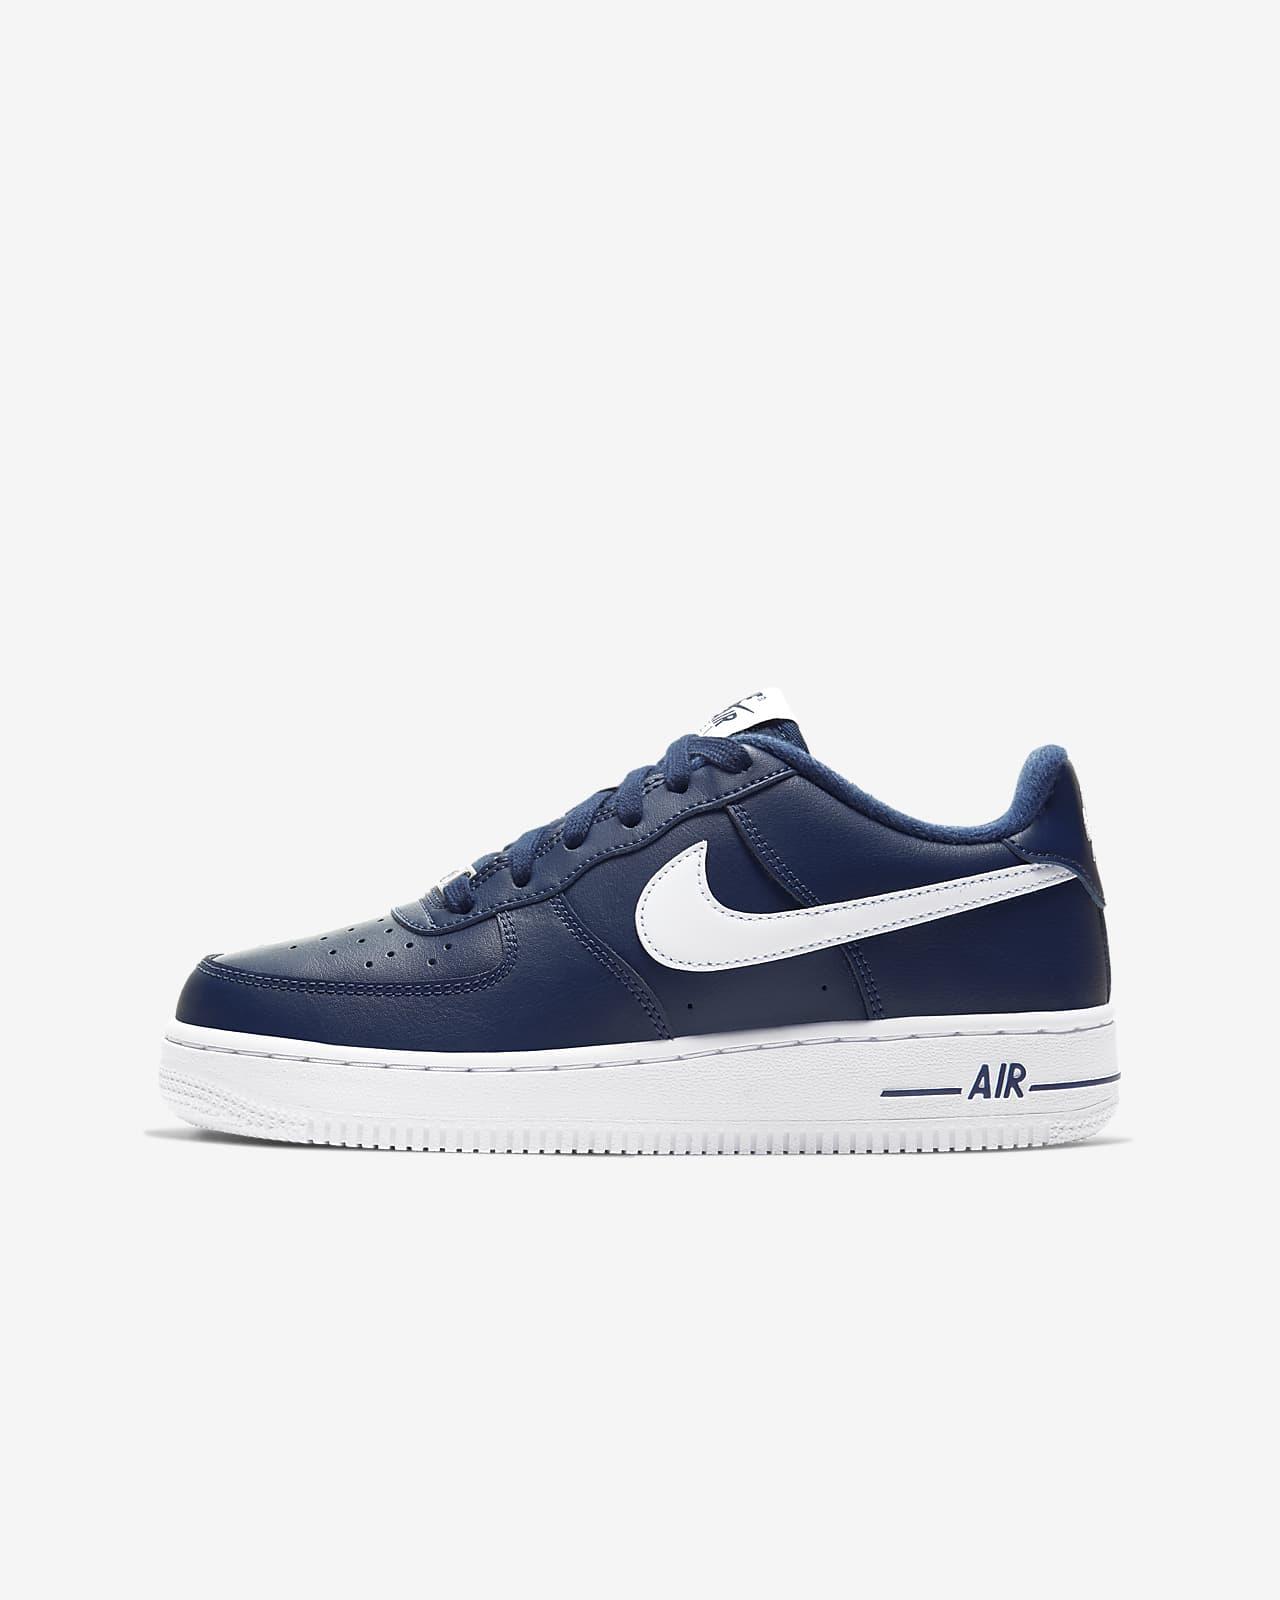 Nike Air Force 1 Schuh für ältere Kinder